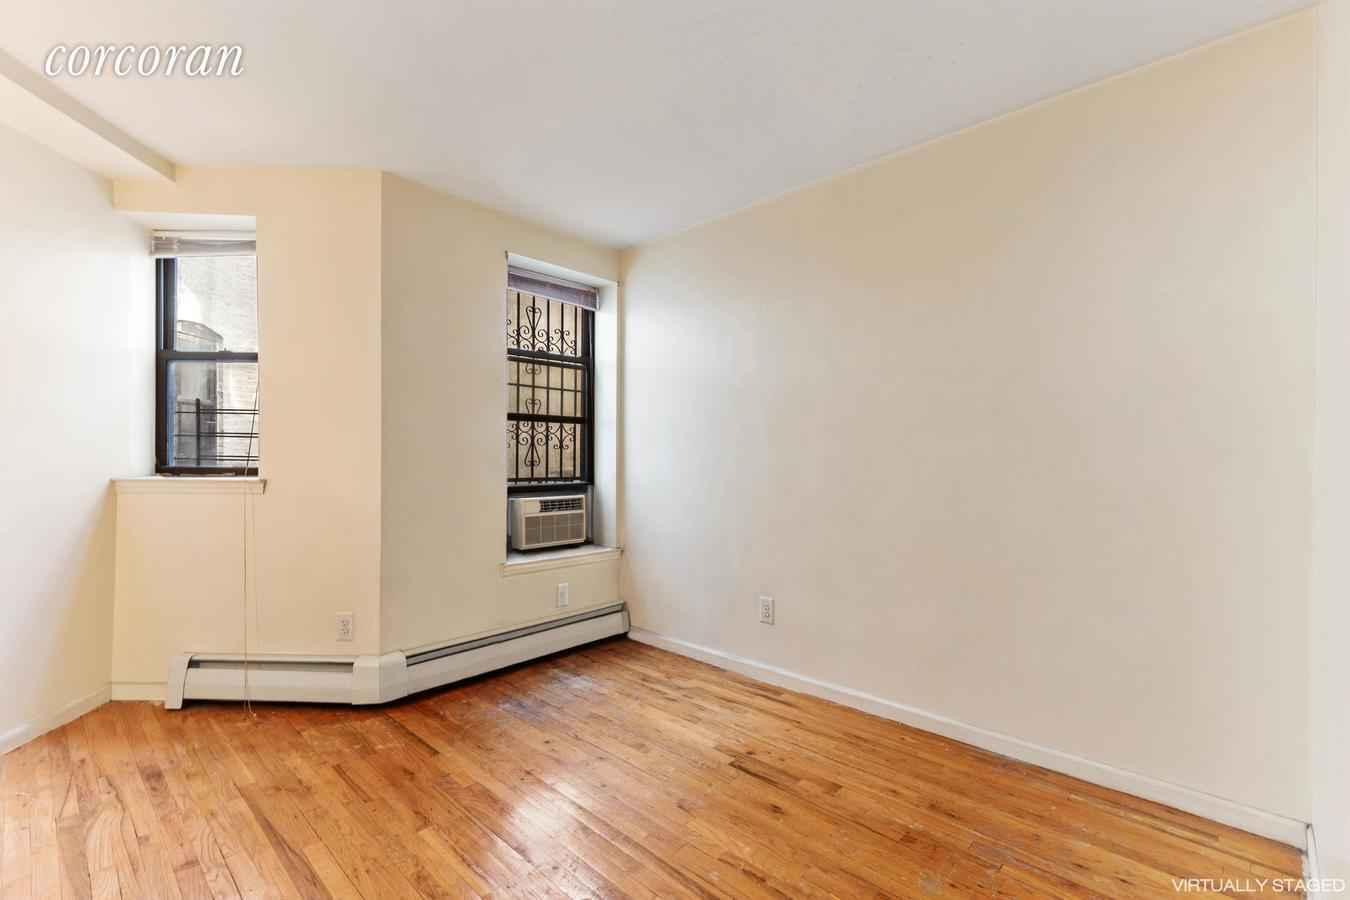 Apartment for sale at 472 Bainbridge Street, Apt 3A